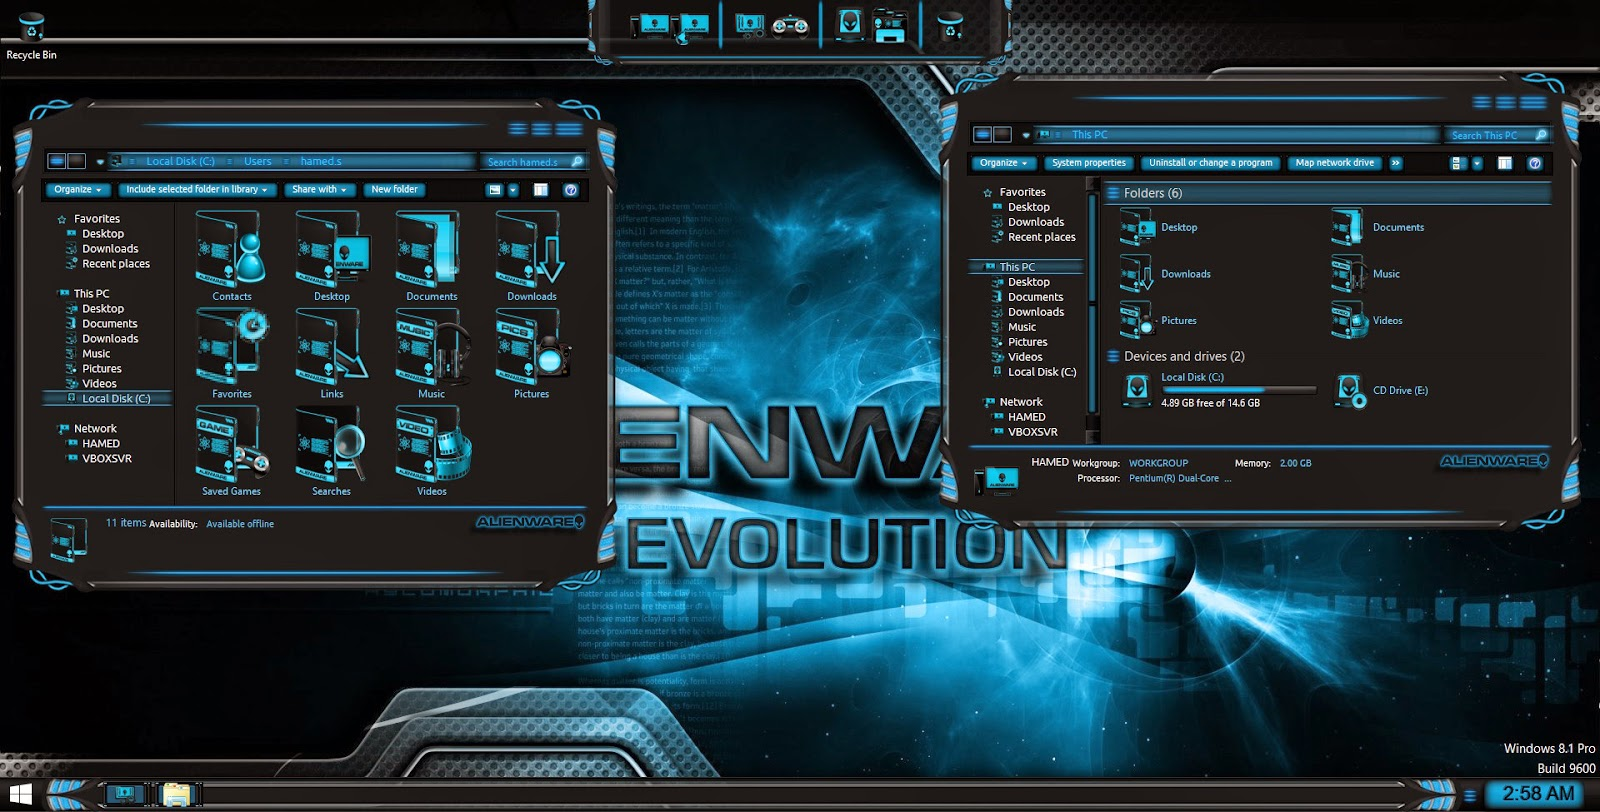 Free Animated Fall Desktop Wallpaper Alienware Evolution Skinpack For Windows 7 8 8 1